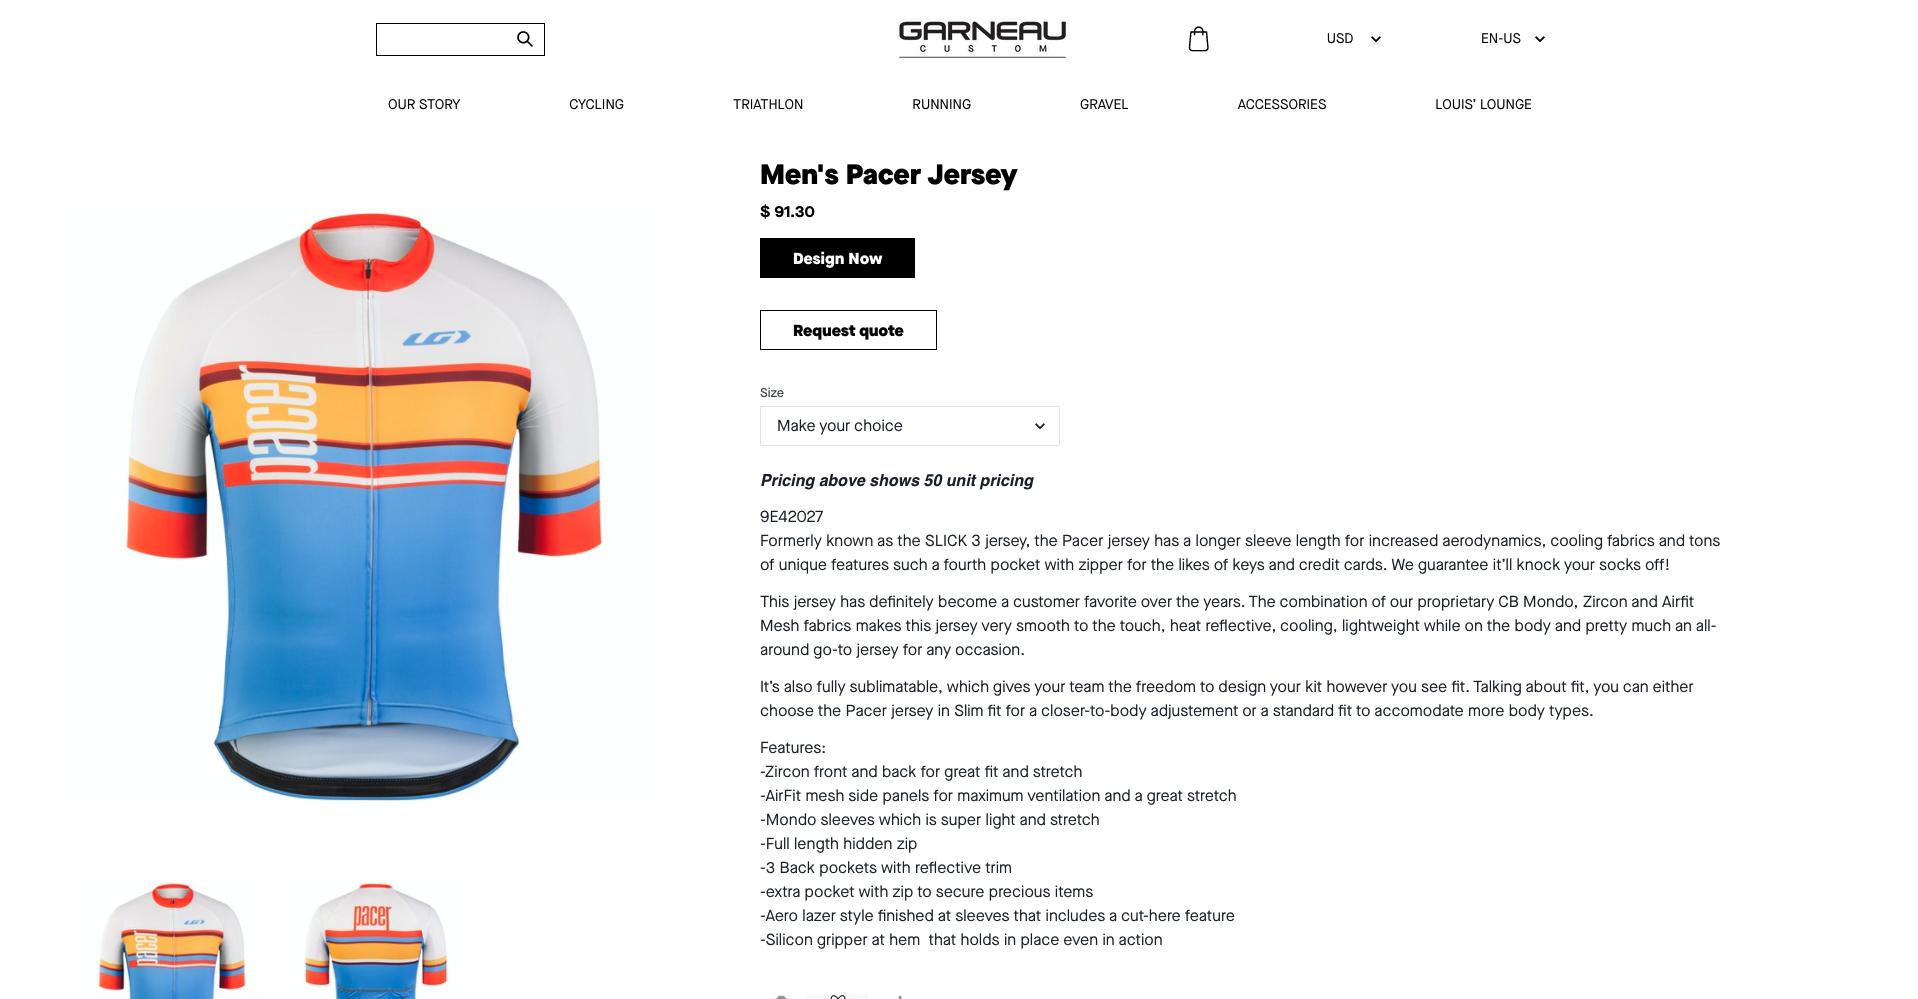 Garneau-product-page